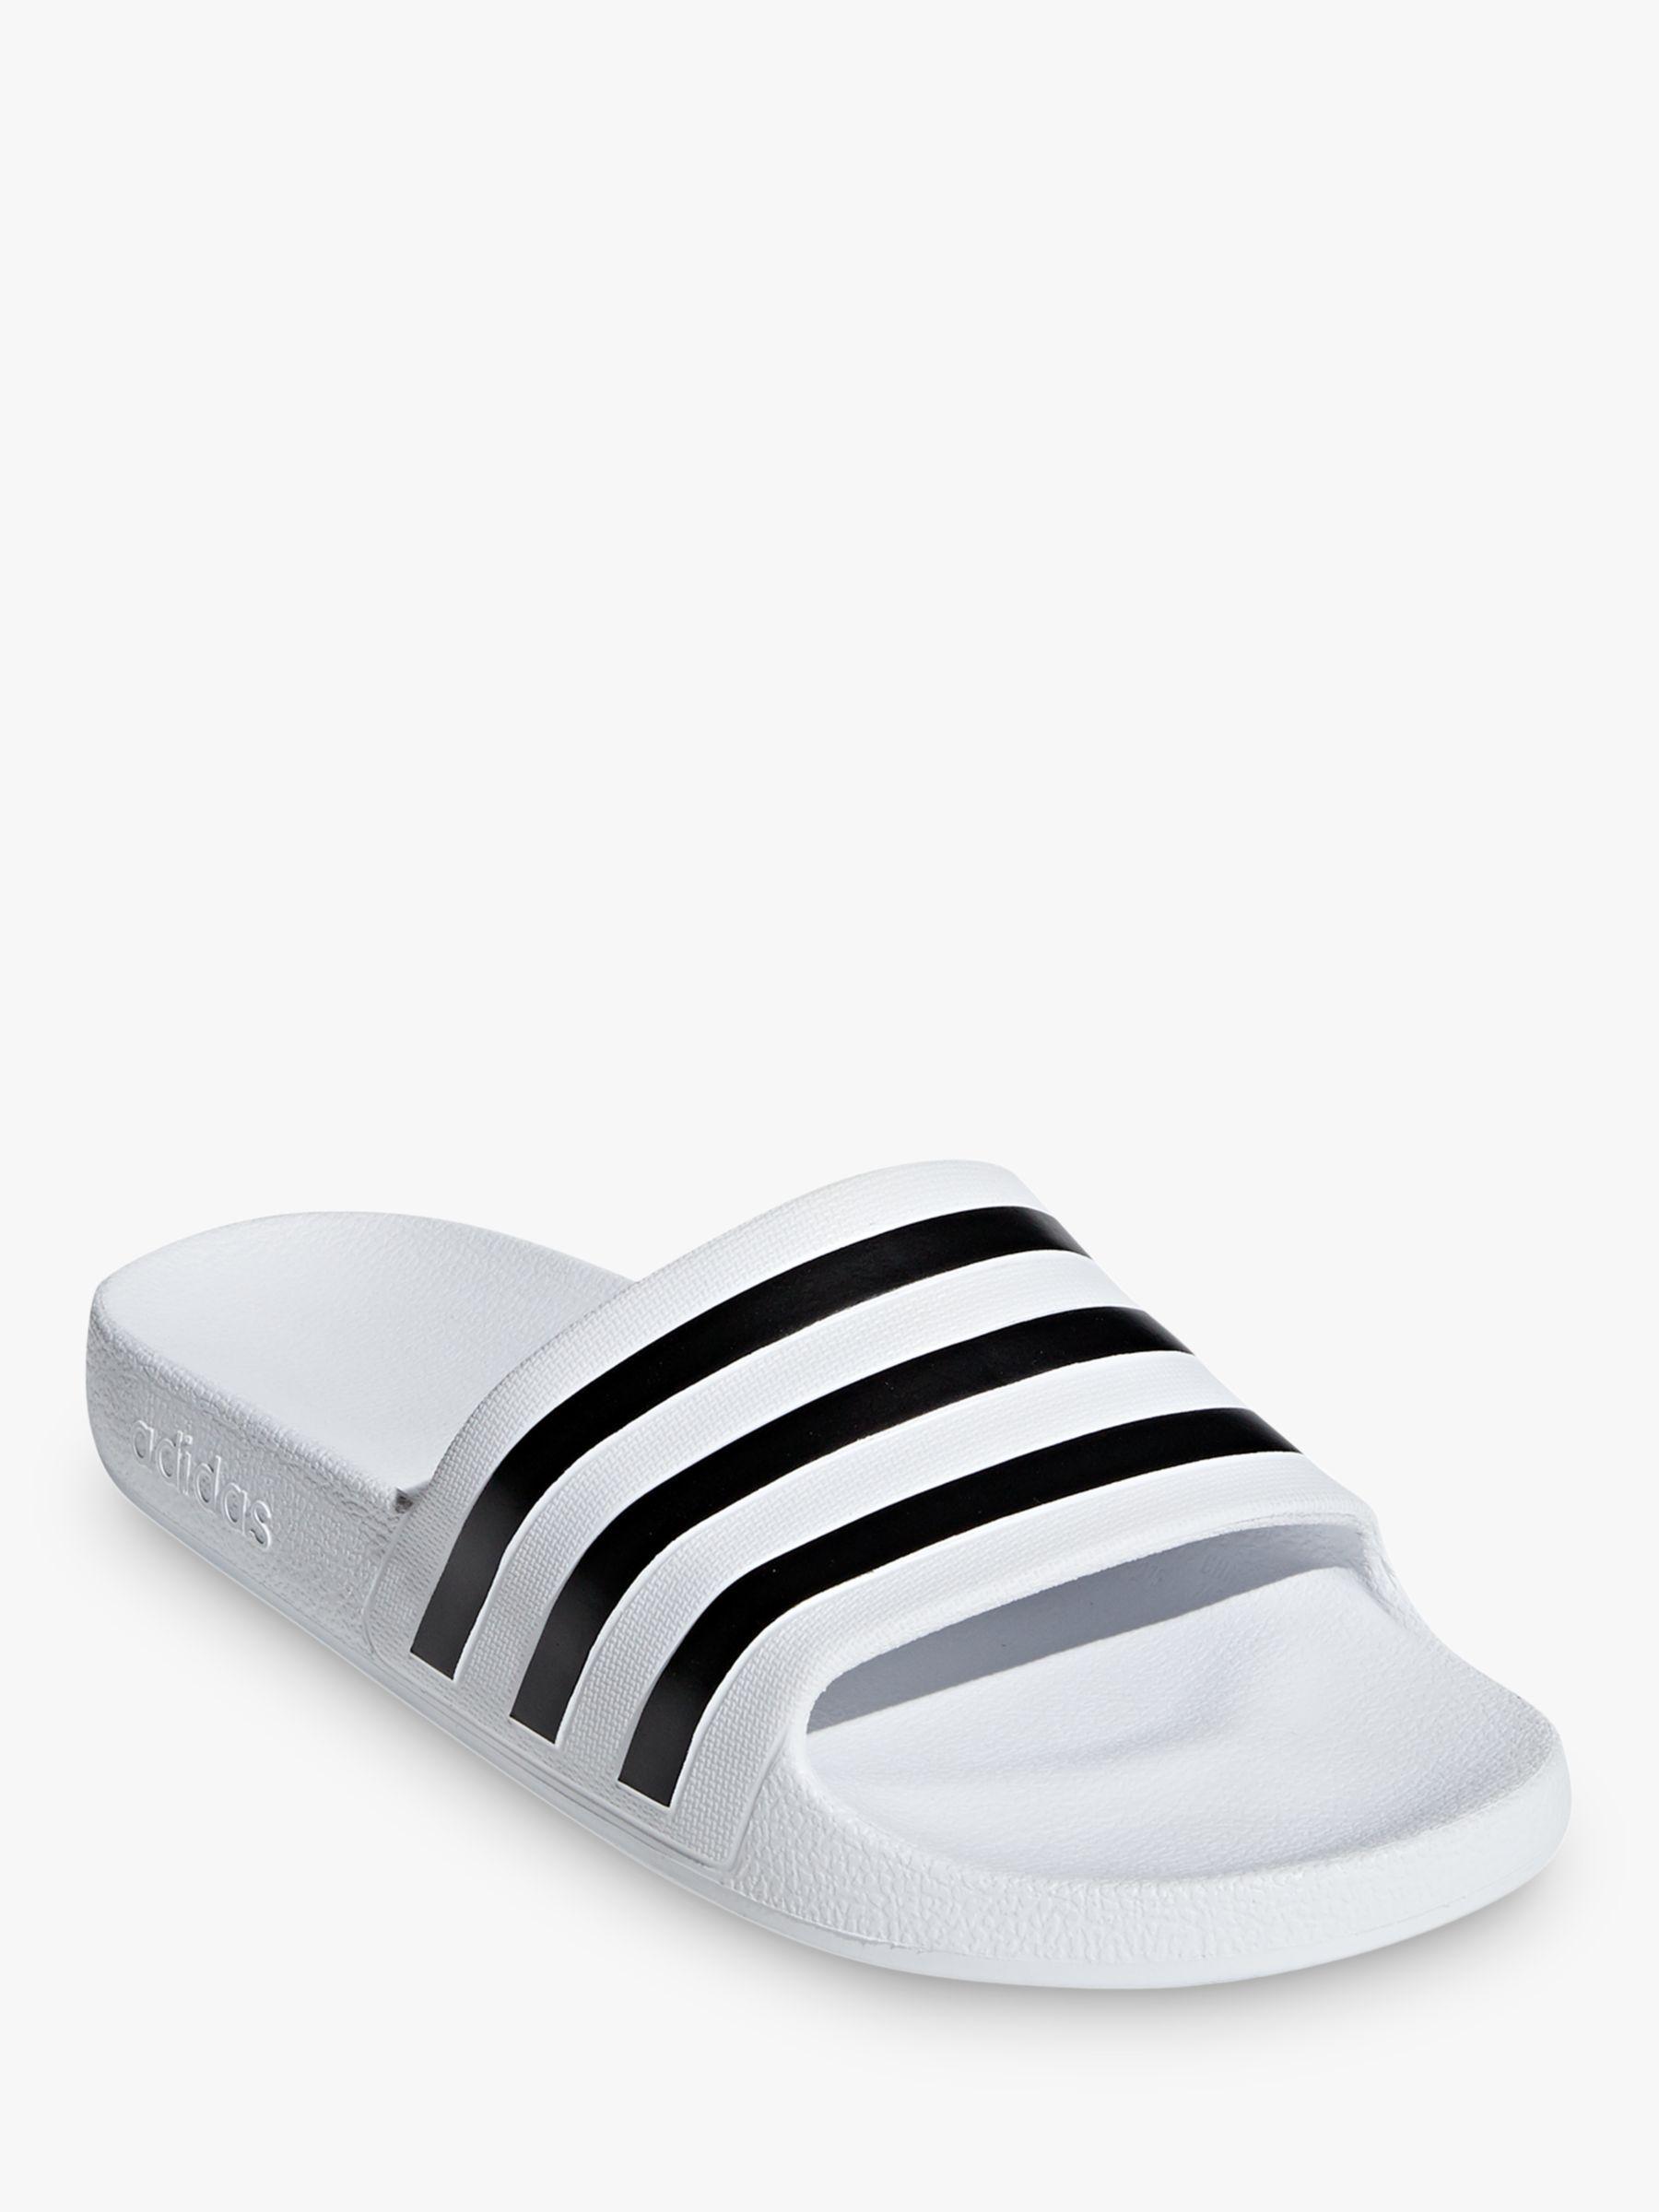 4e0b0134aaab adidas Adilette Aqua Women s Slides Slippers in Black - Lyst